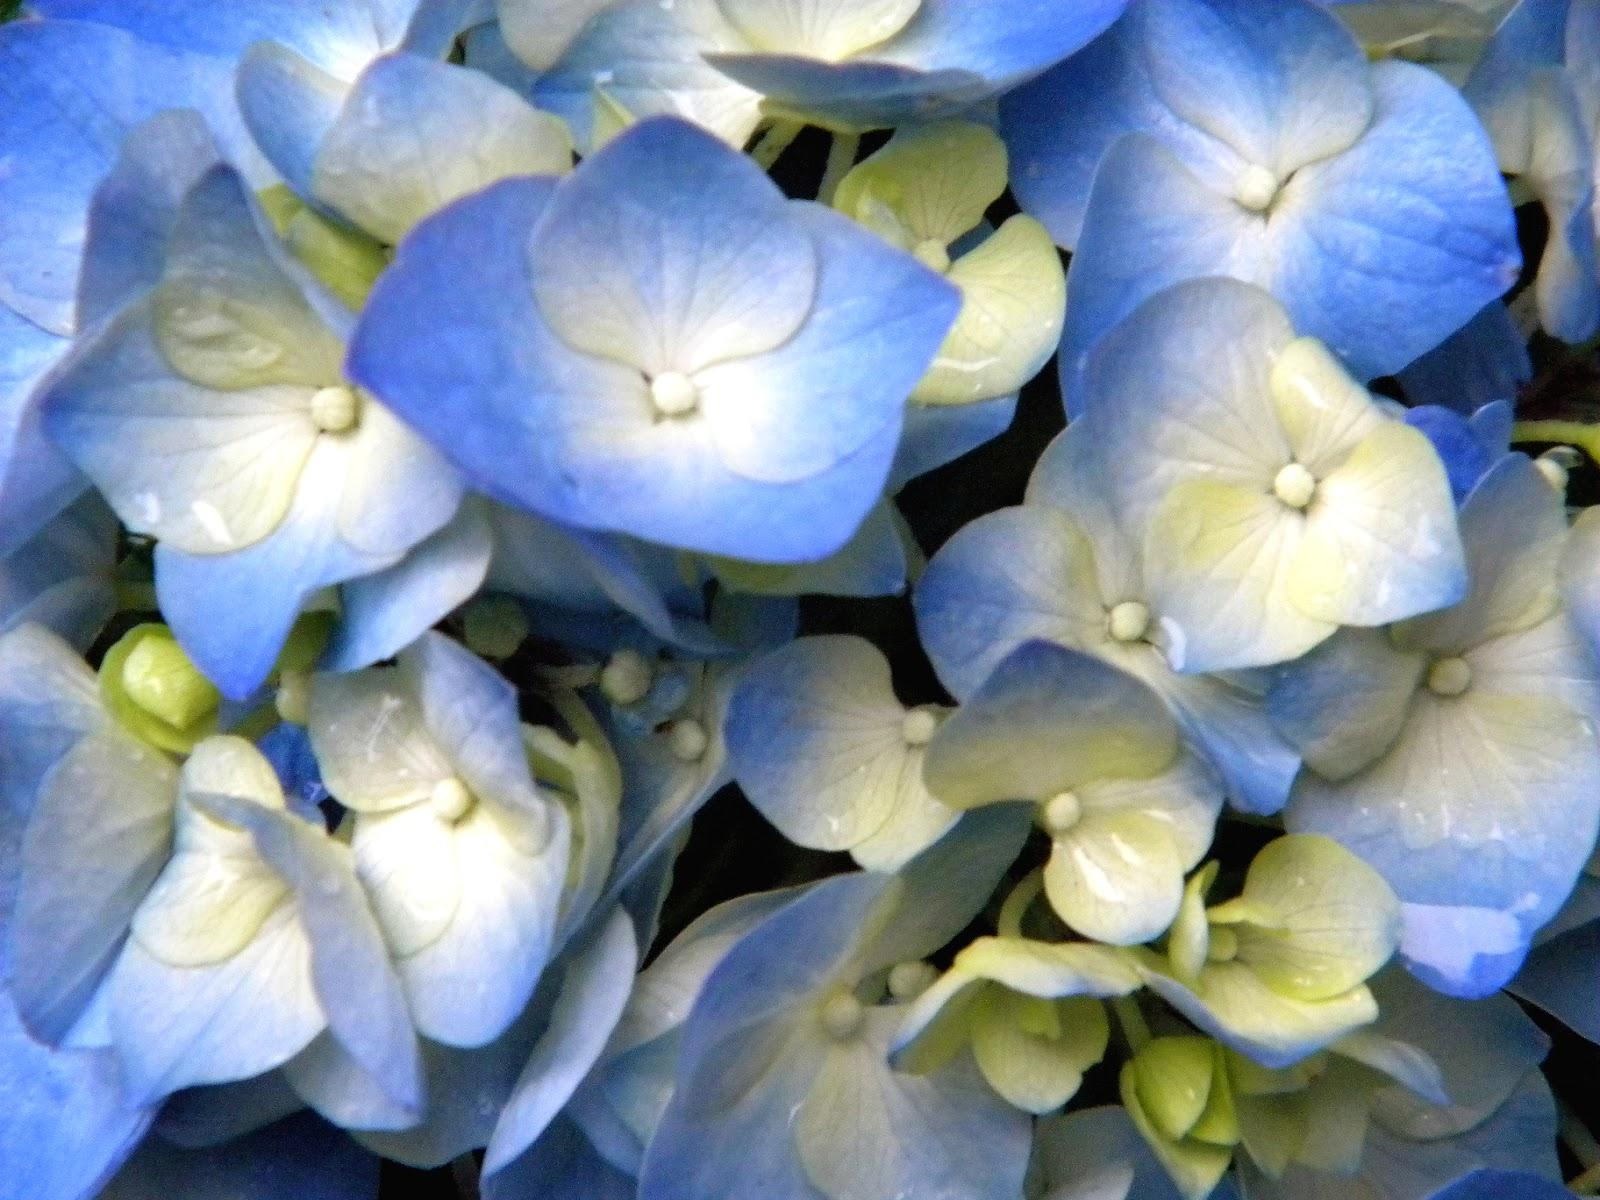 Hydrangea Blue spring flowers in NYC